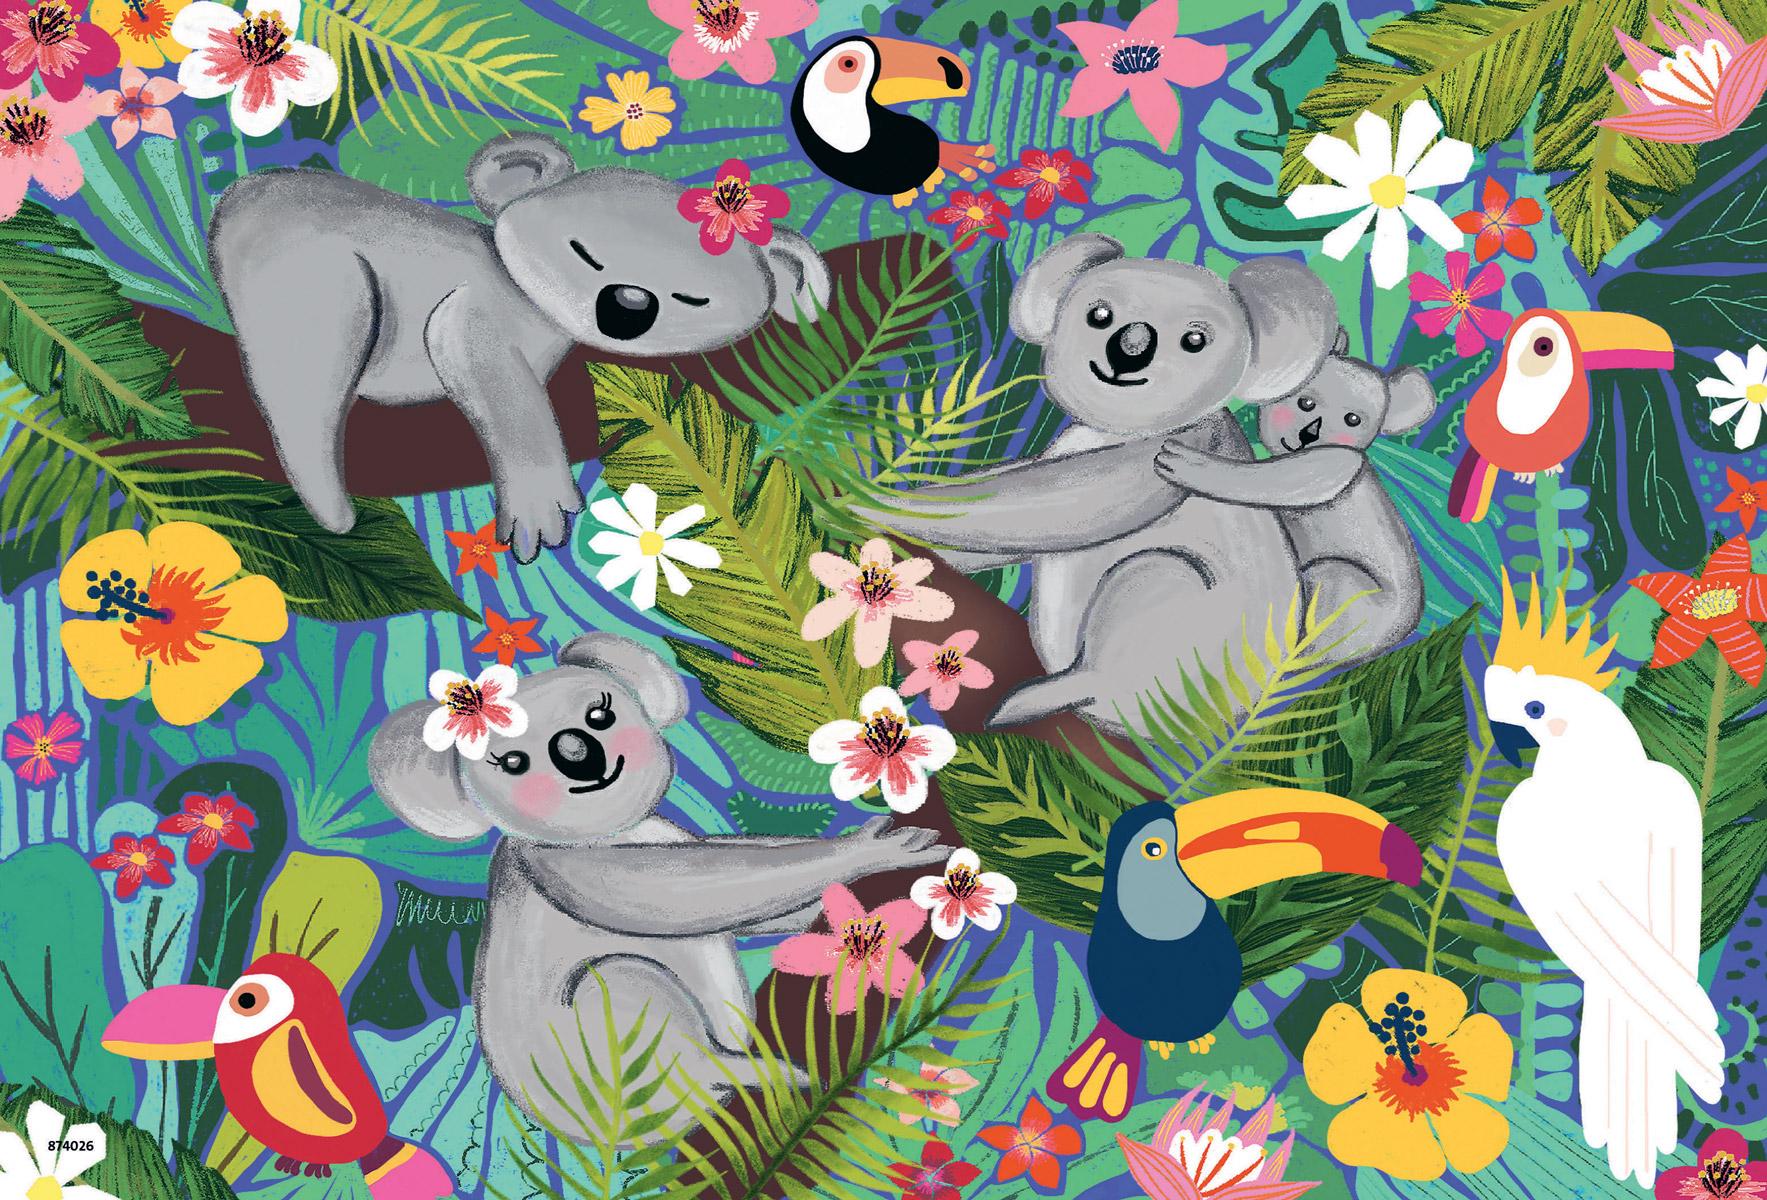 Koalas and Sloths Animals Jigsaw Puzzle